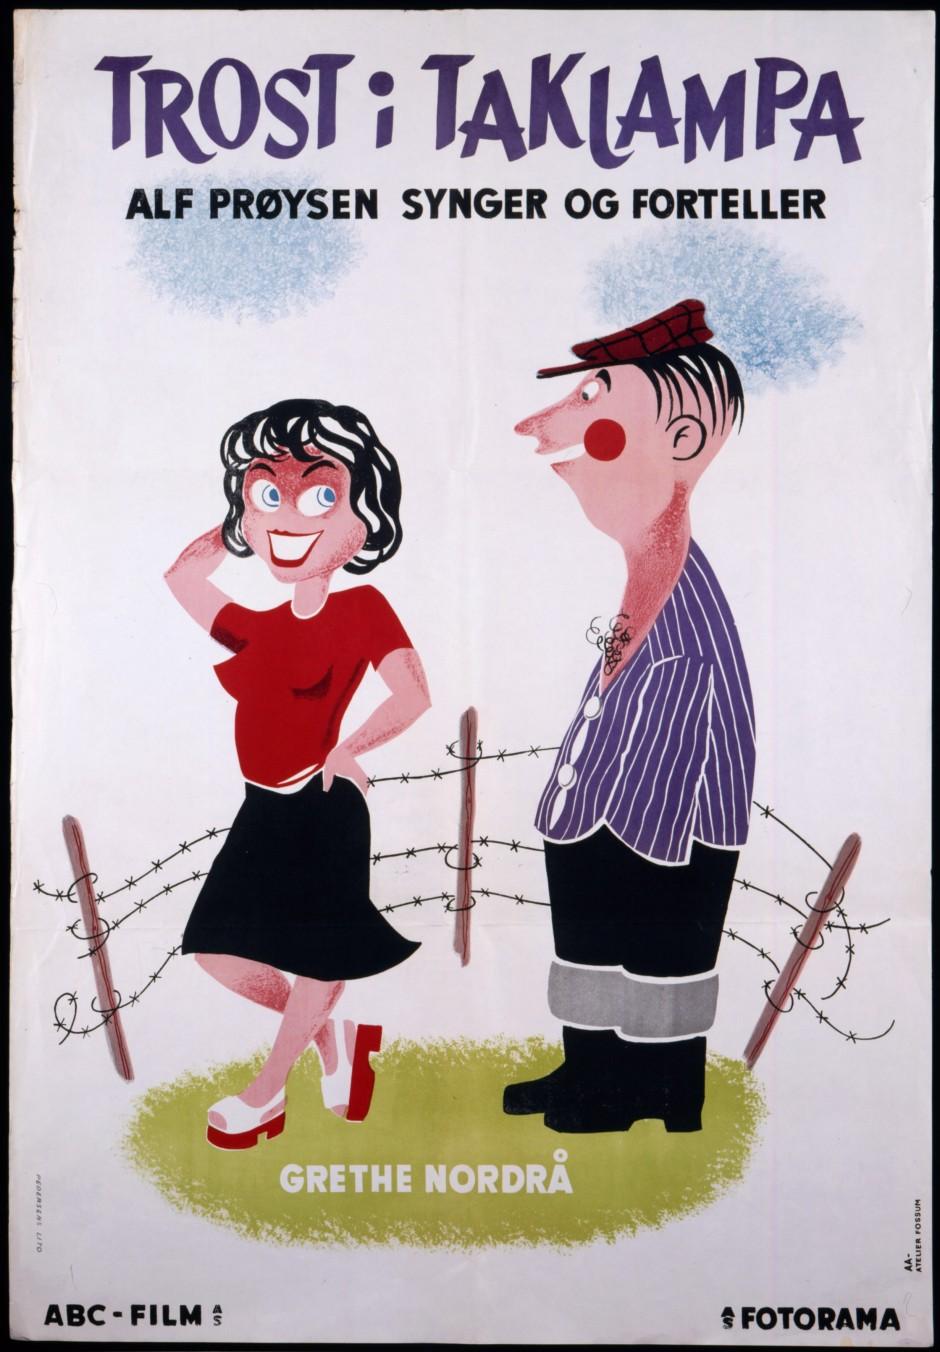 Trost i taklampa (1955)